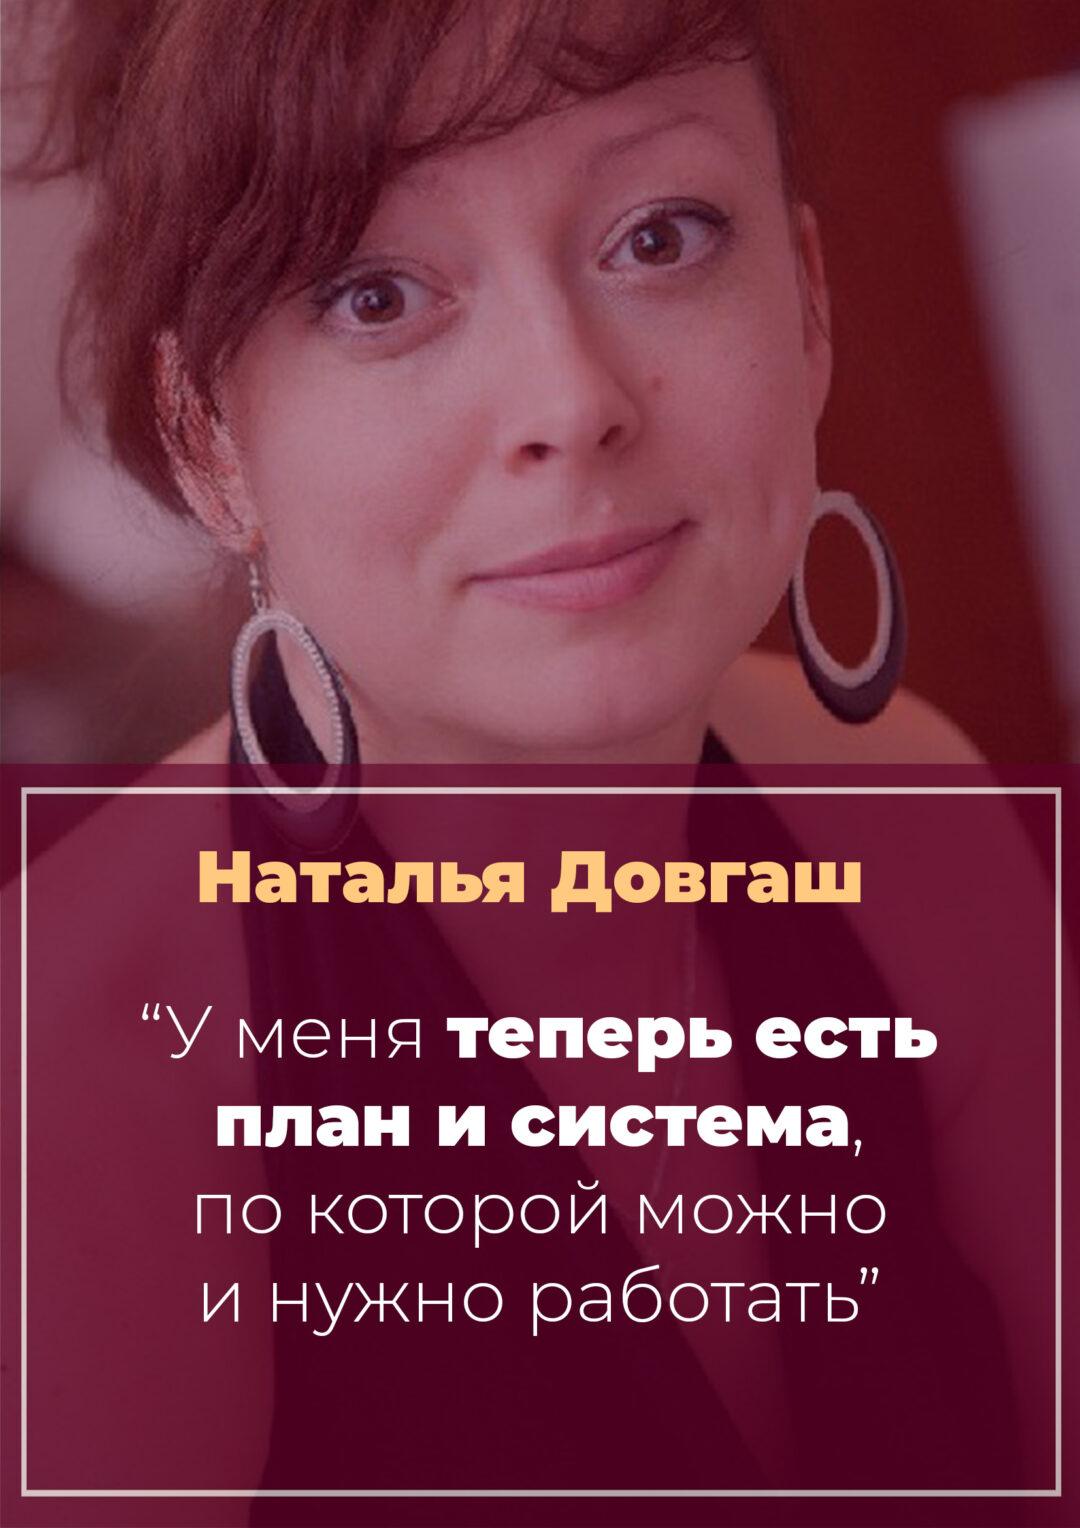 История Натальи Довгаш